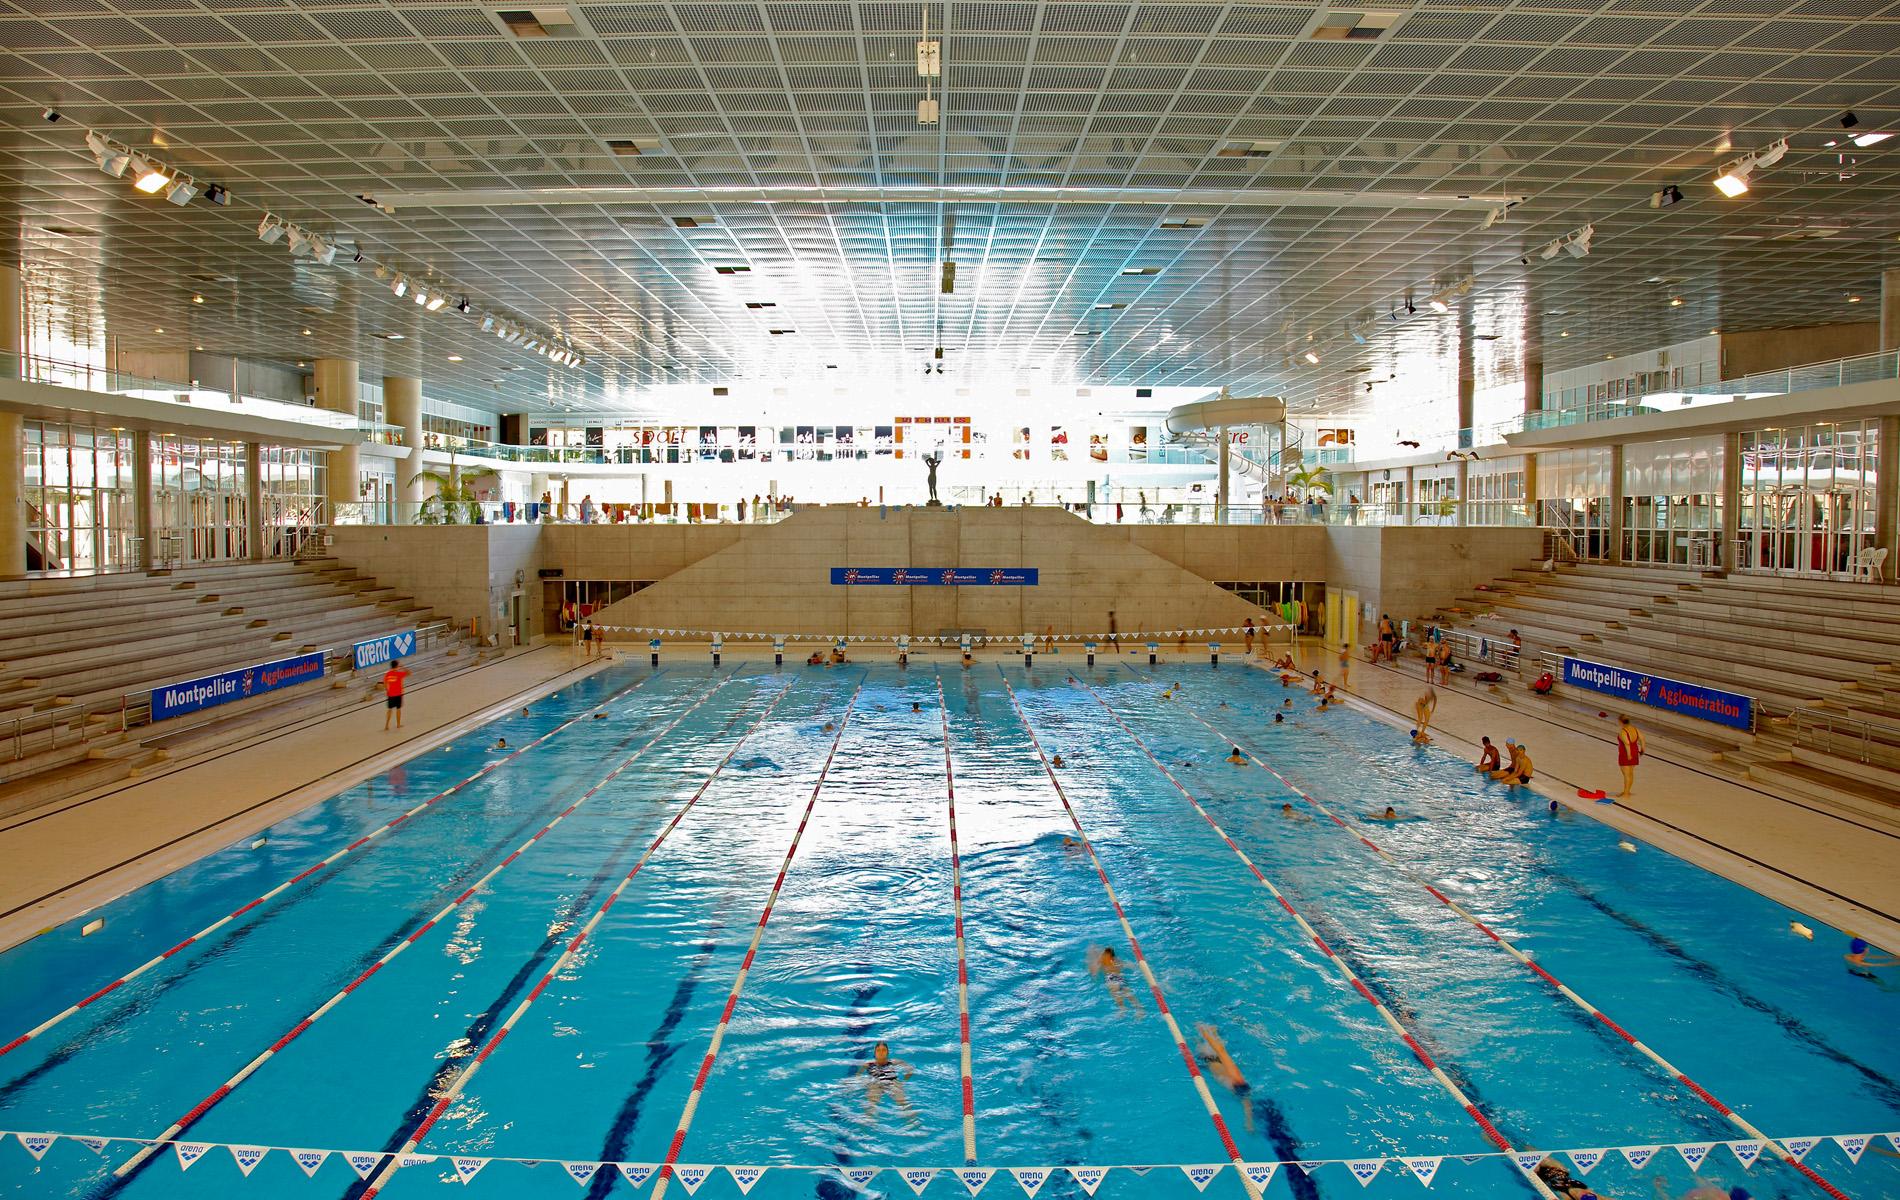 Swimming pool wallpaper desktop wallpapersafari for Swimmingpool aufstellbecken pool